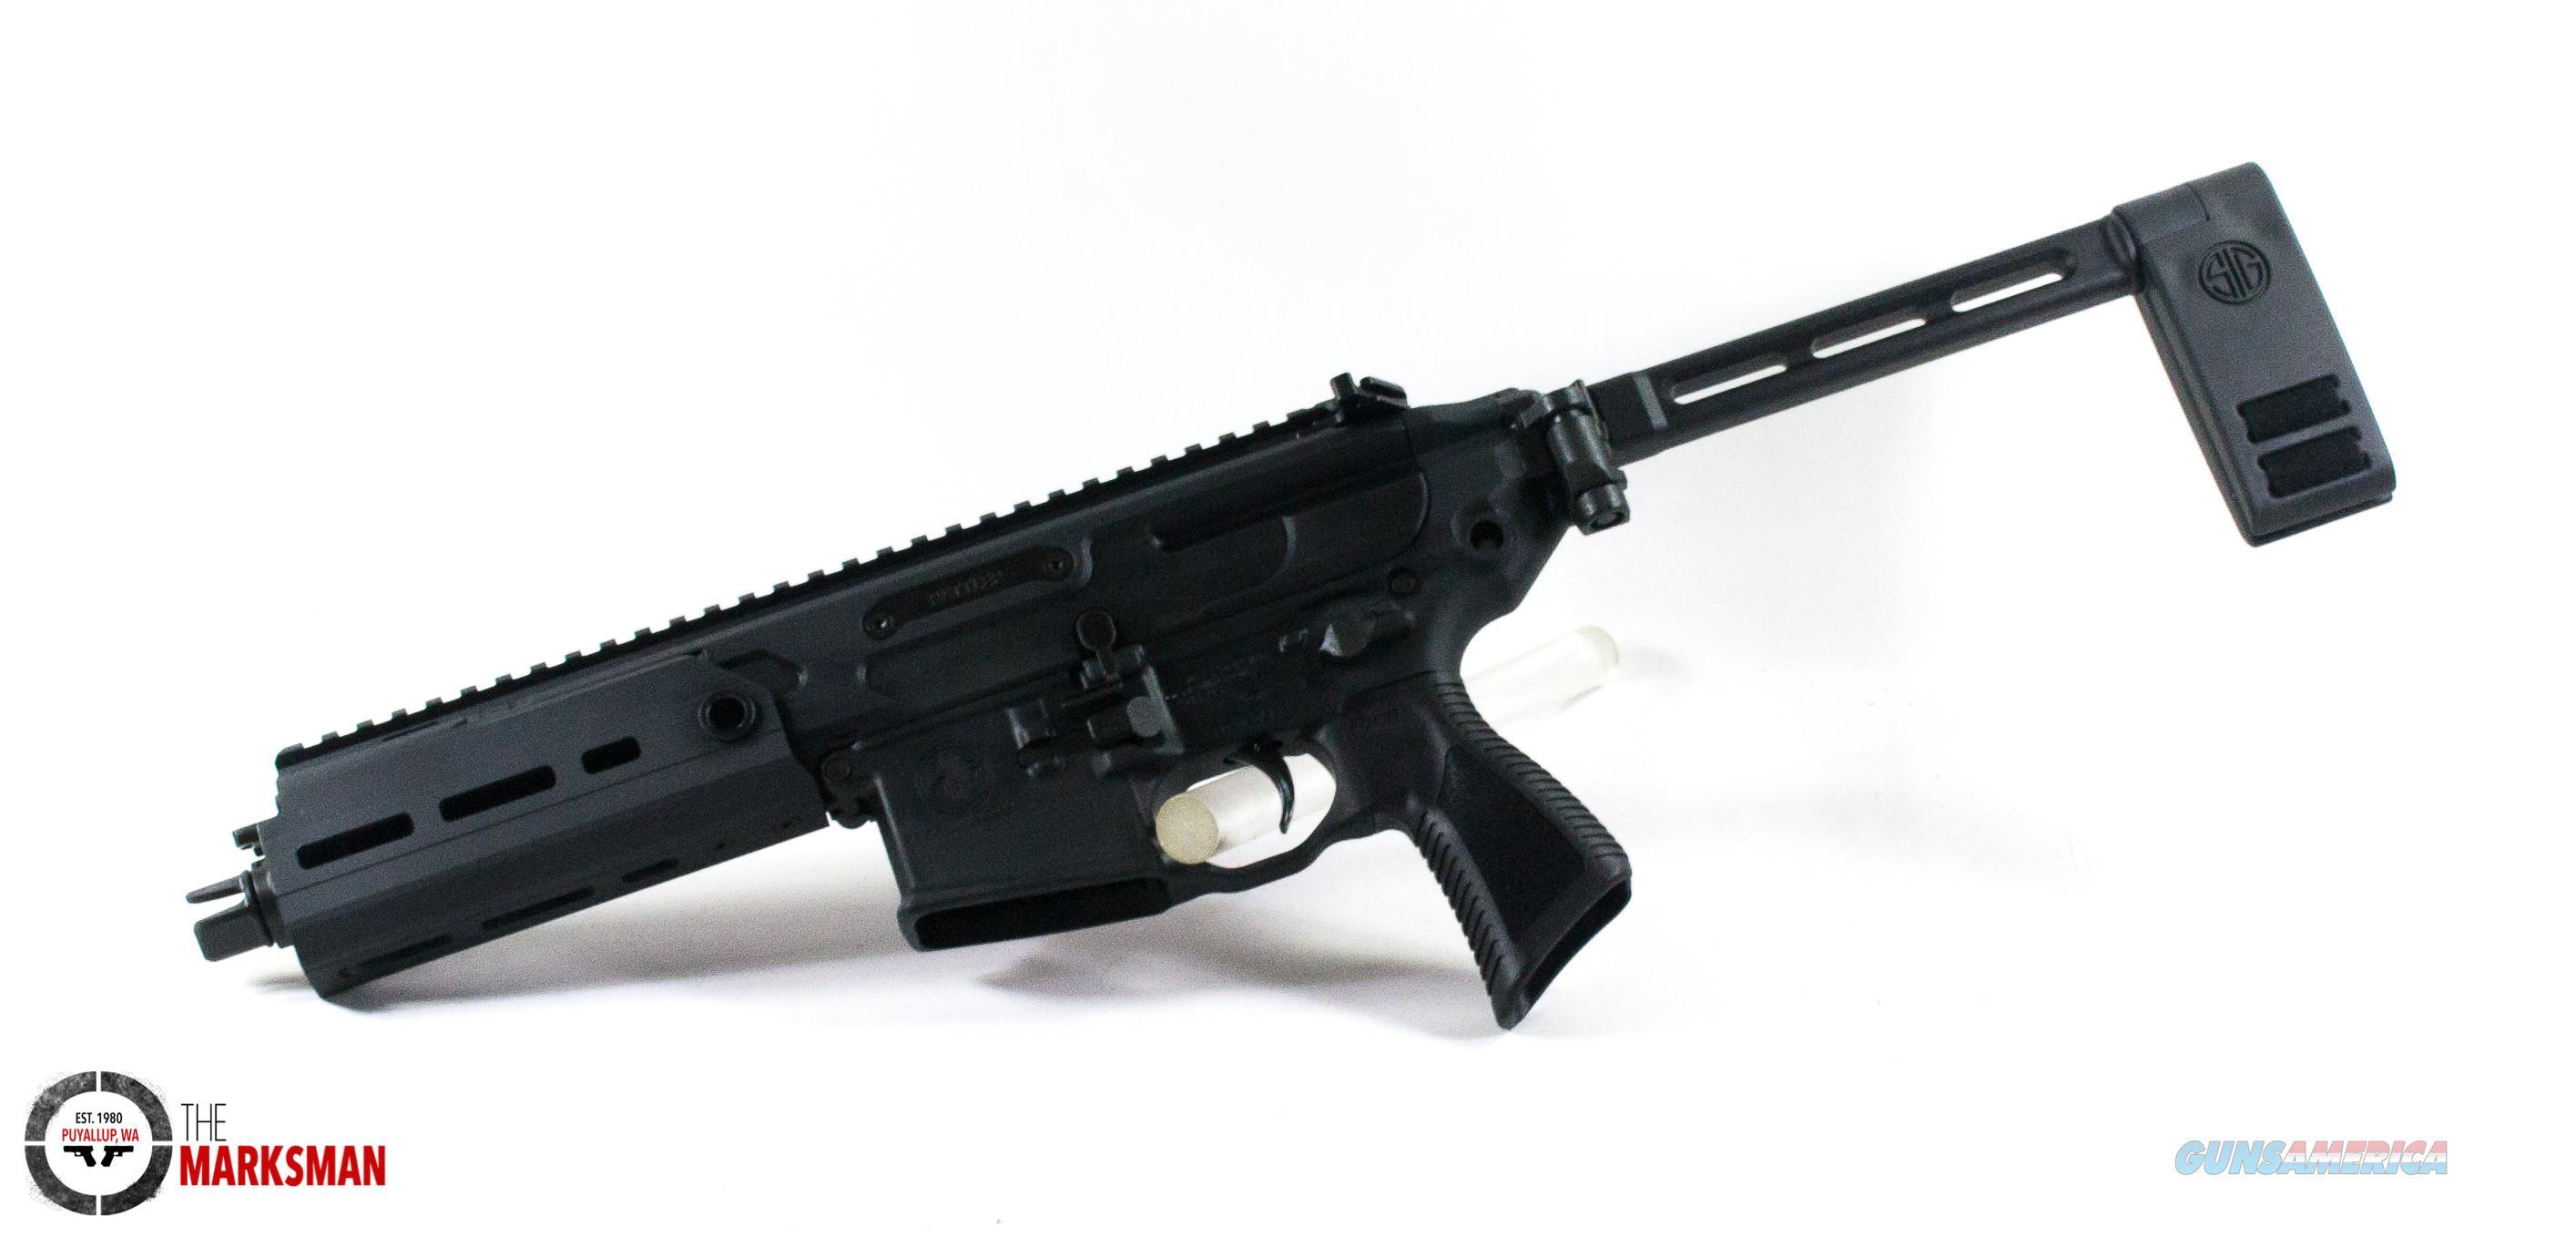 Sig Sauer MCX Rattler Pistol, .223 Rem./5.56 NATO, FREE SHIP  Guns > Pistols > Sig - Sauer/Sigarms Pistols > MPX / MCX